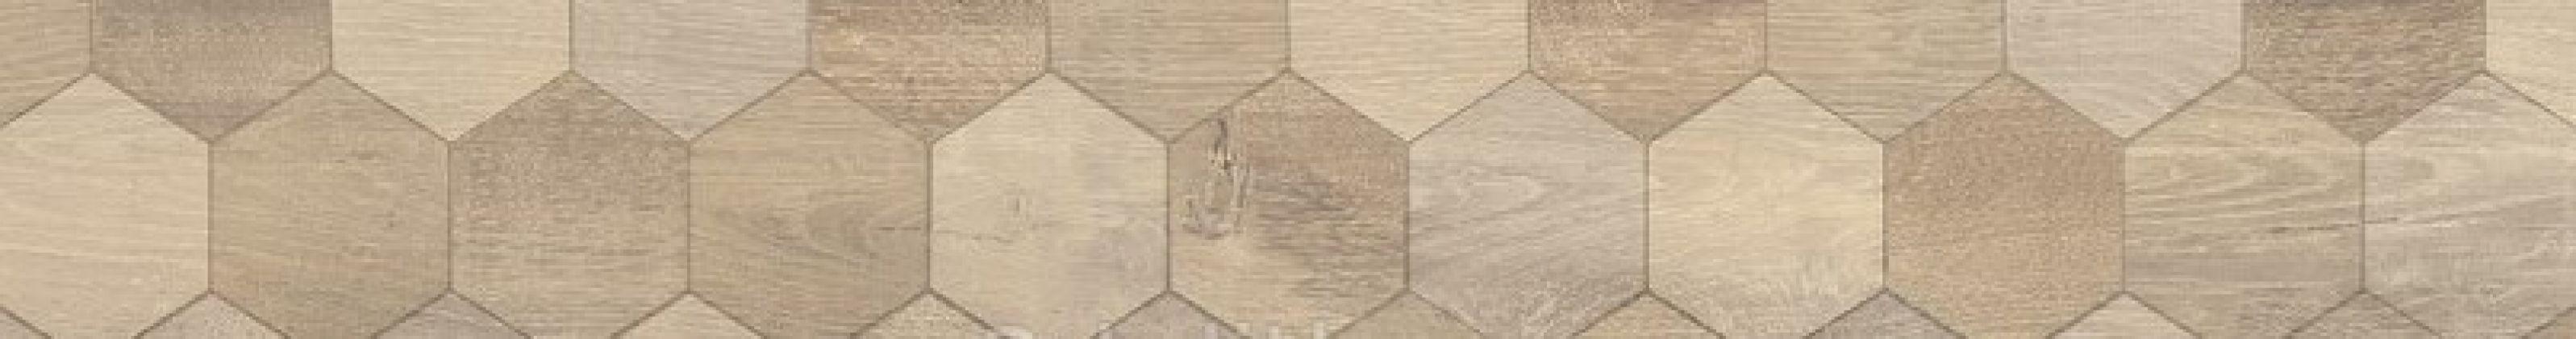 TUDOR Intarsio Beige 15x90